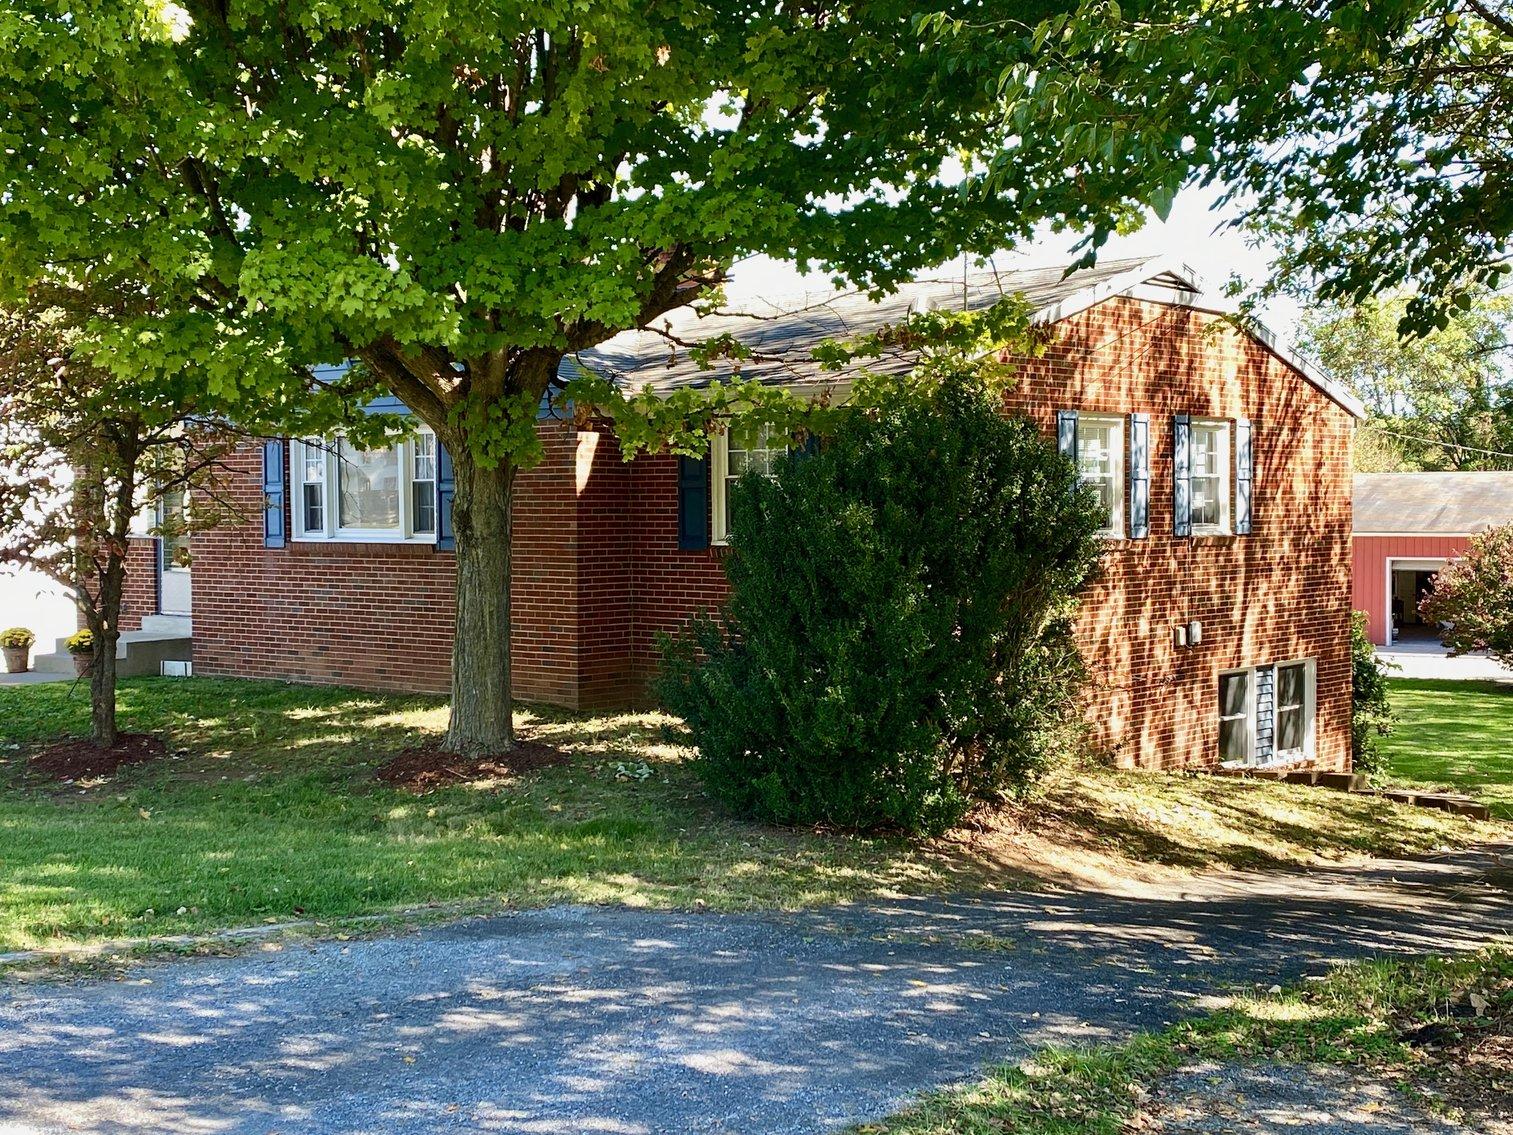 Image for 3 BR/2 BA Brick Home on .5 +/- Acre Lot w/1,500 +/- sf. Workshop/Garage--Clarke County, VA